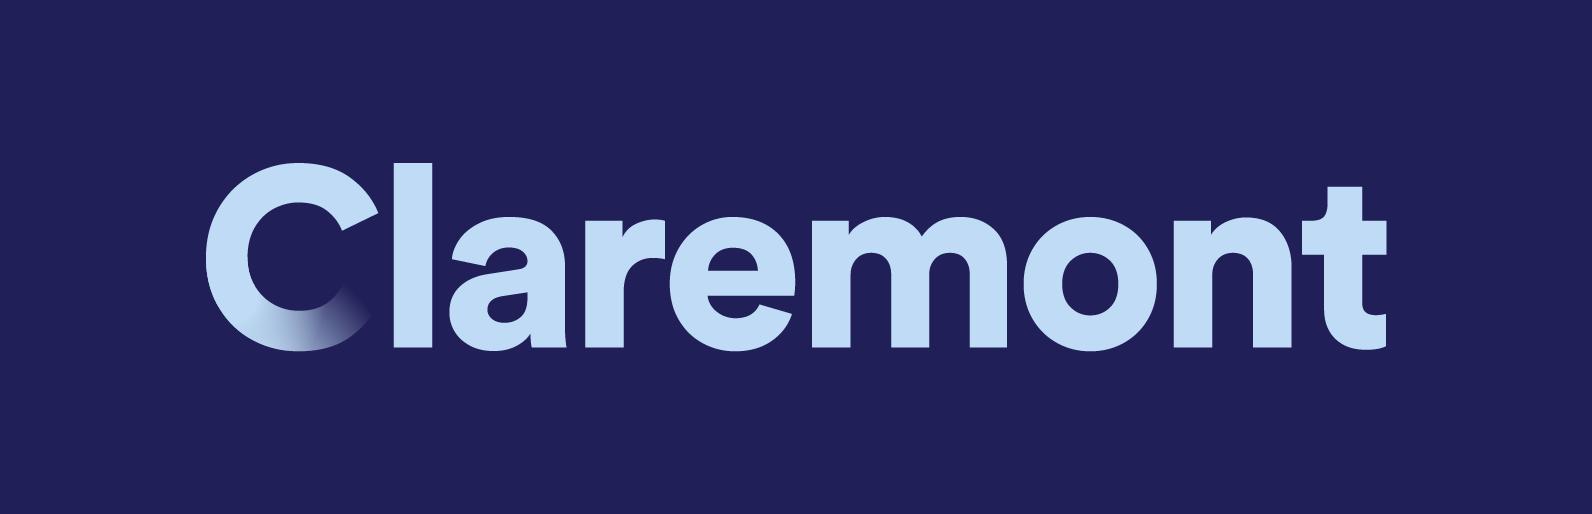 Claremont_Logo_LjusMorkbla_RGB